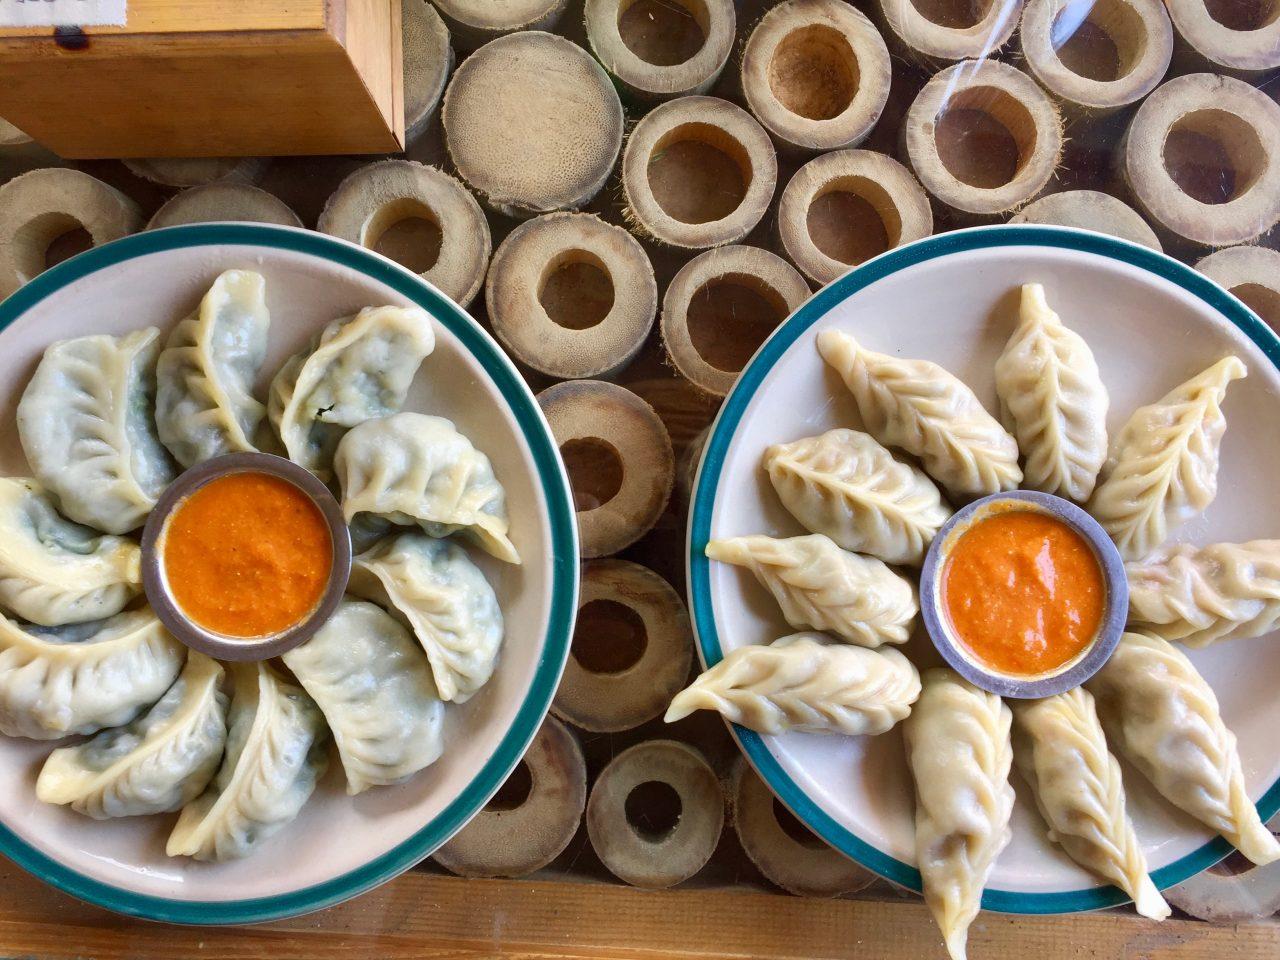 Momos, Basuri Veg Restaurant, Kathmandu, Nepal